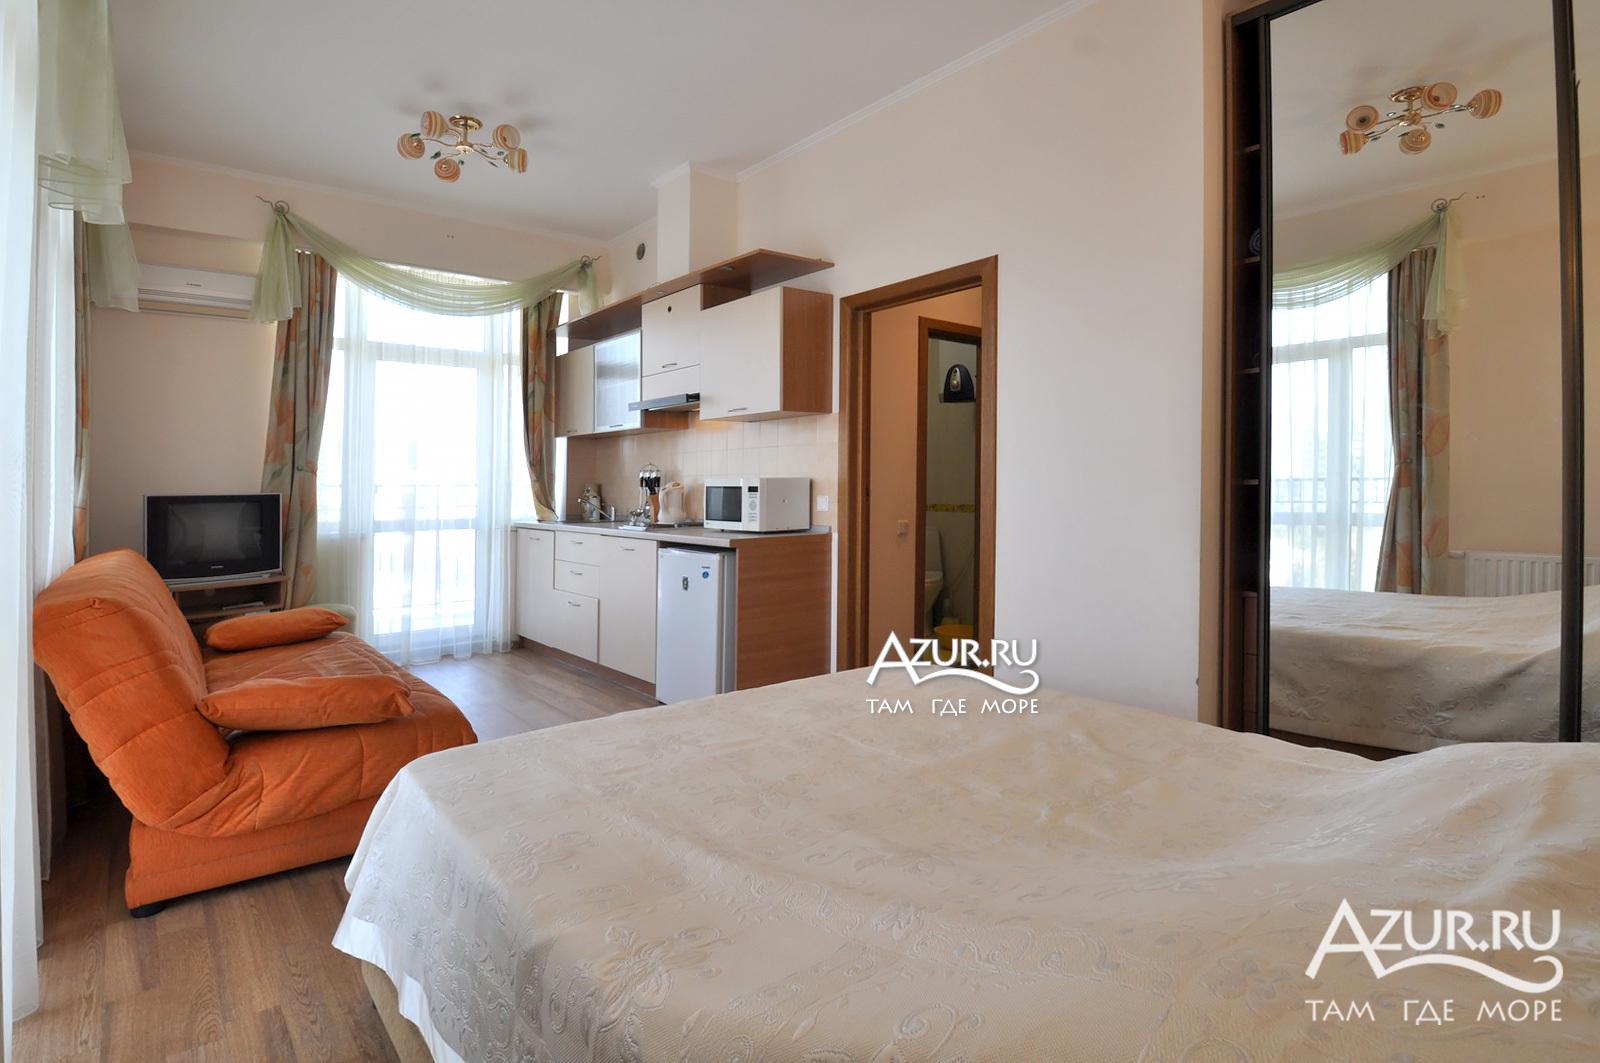 Однокомнатная квартира с двумя балконами.